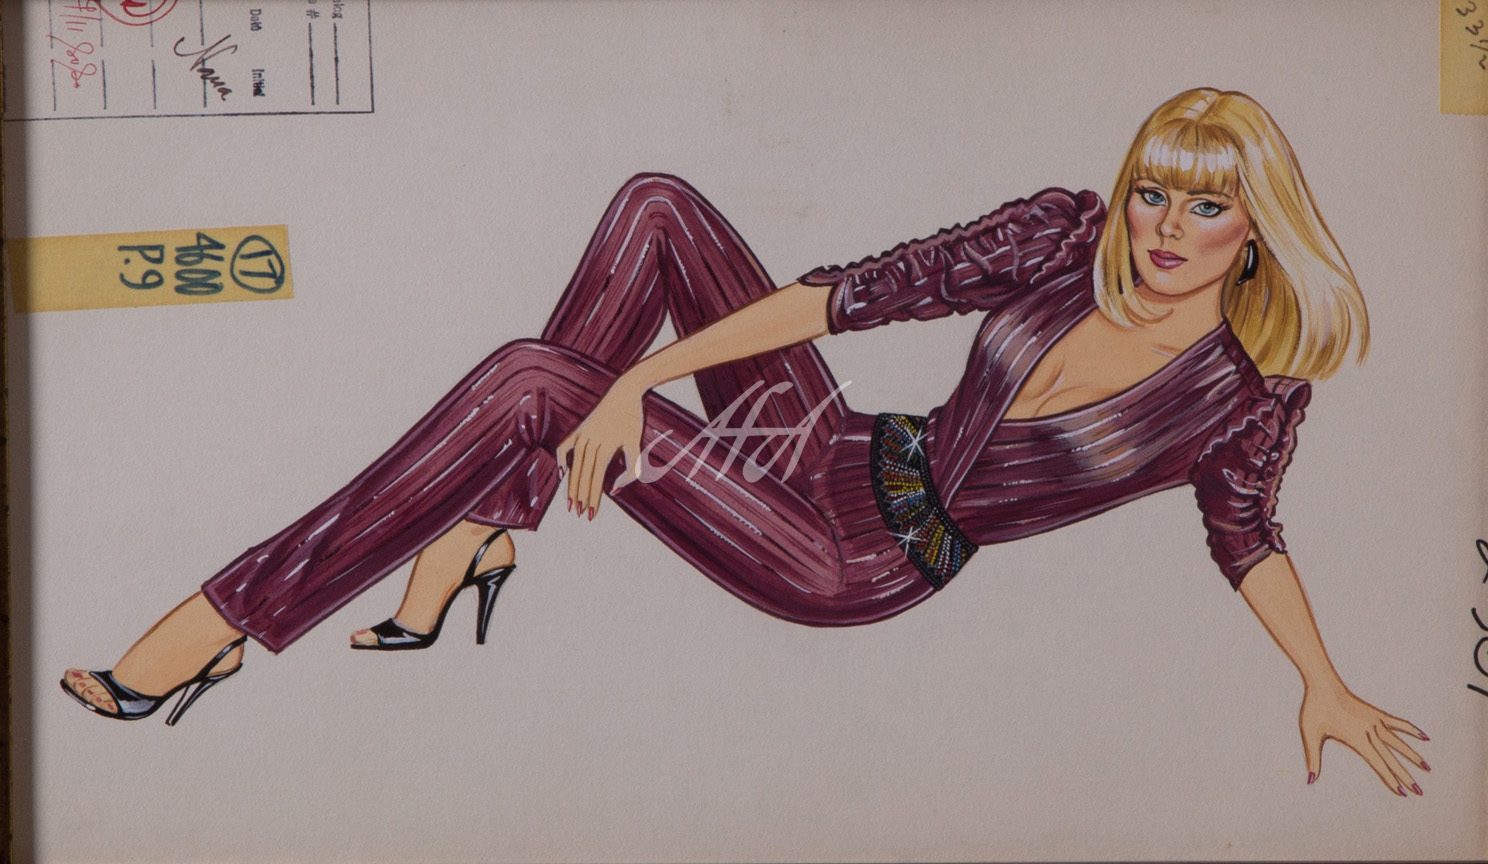 HCFM_Mellinger_ht4516_purplesuit_framed LoRes watermark.jpg